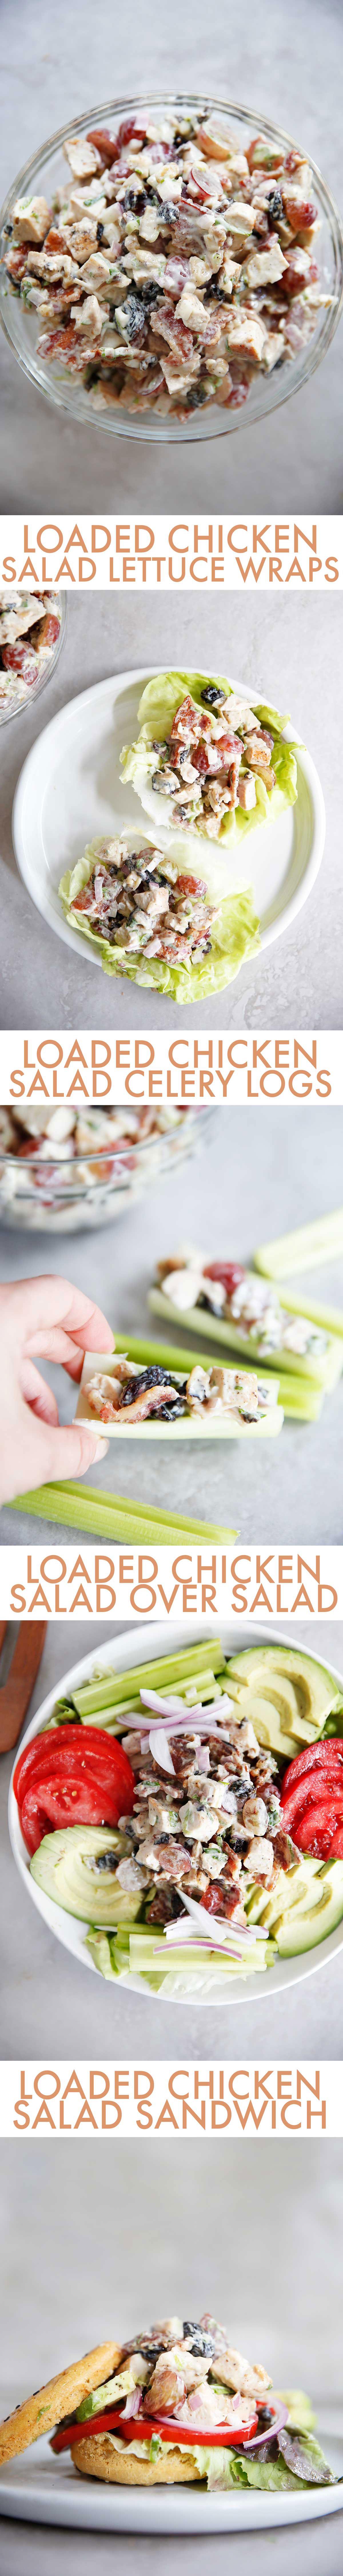 Loaded Chicken Salad: Four Ways | Lexi's Clean Kitchen